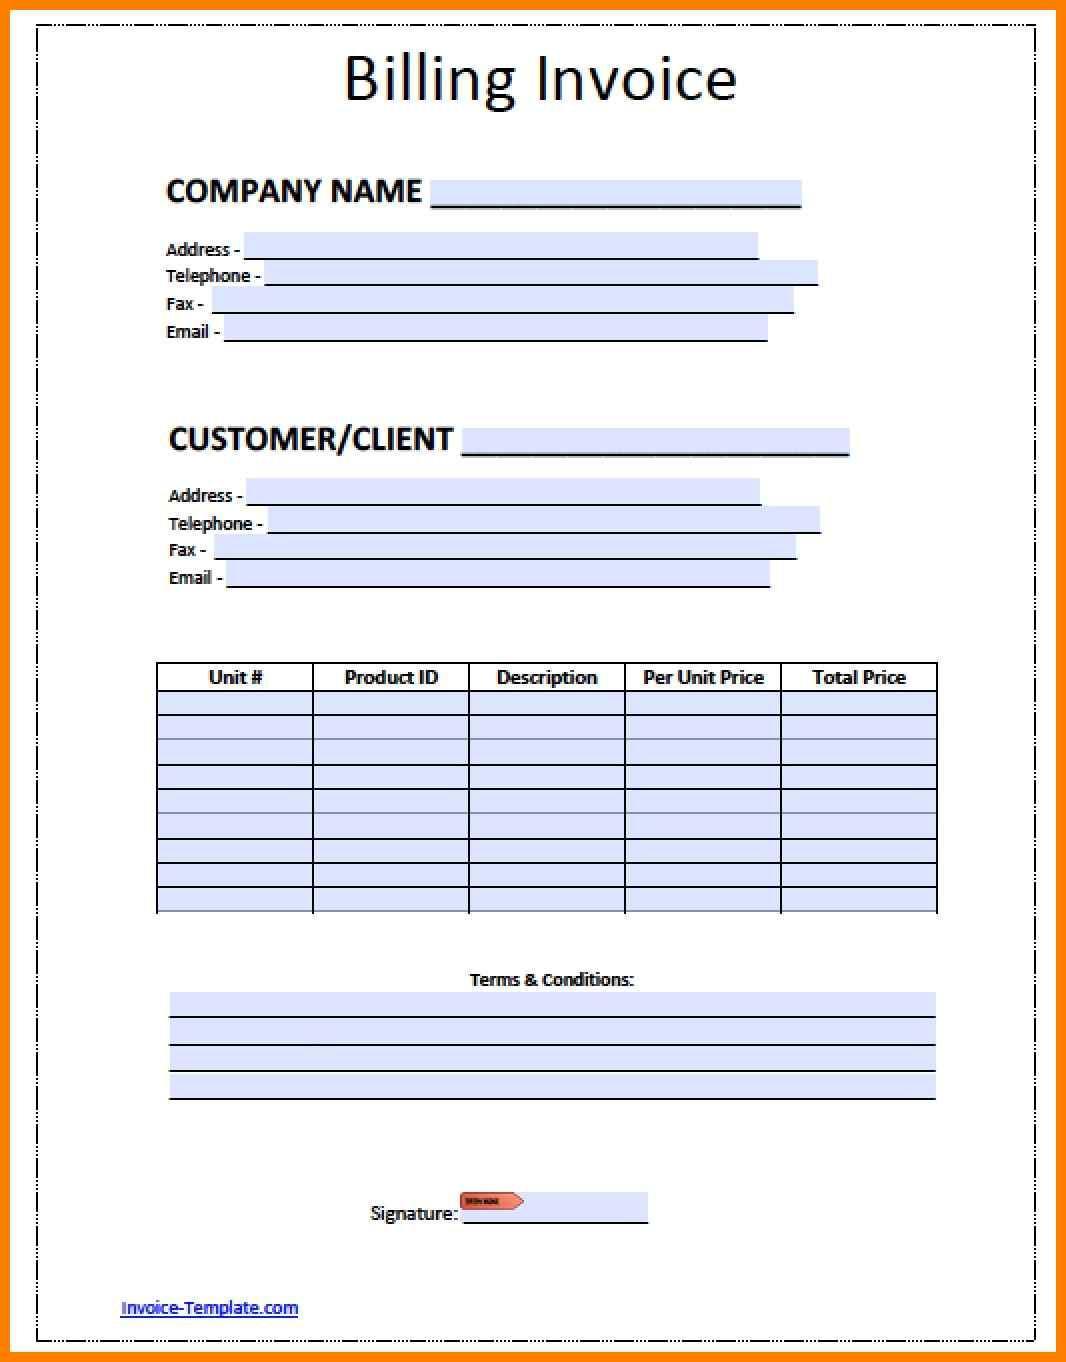 Blank Billing Invoice Template Pdf